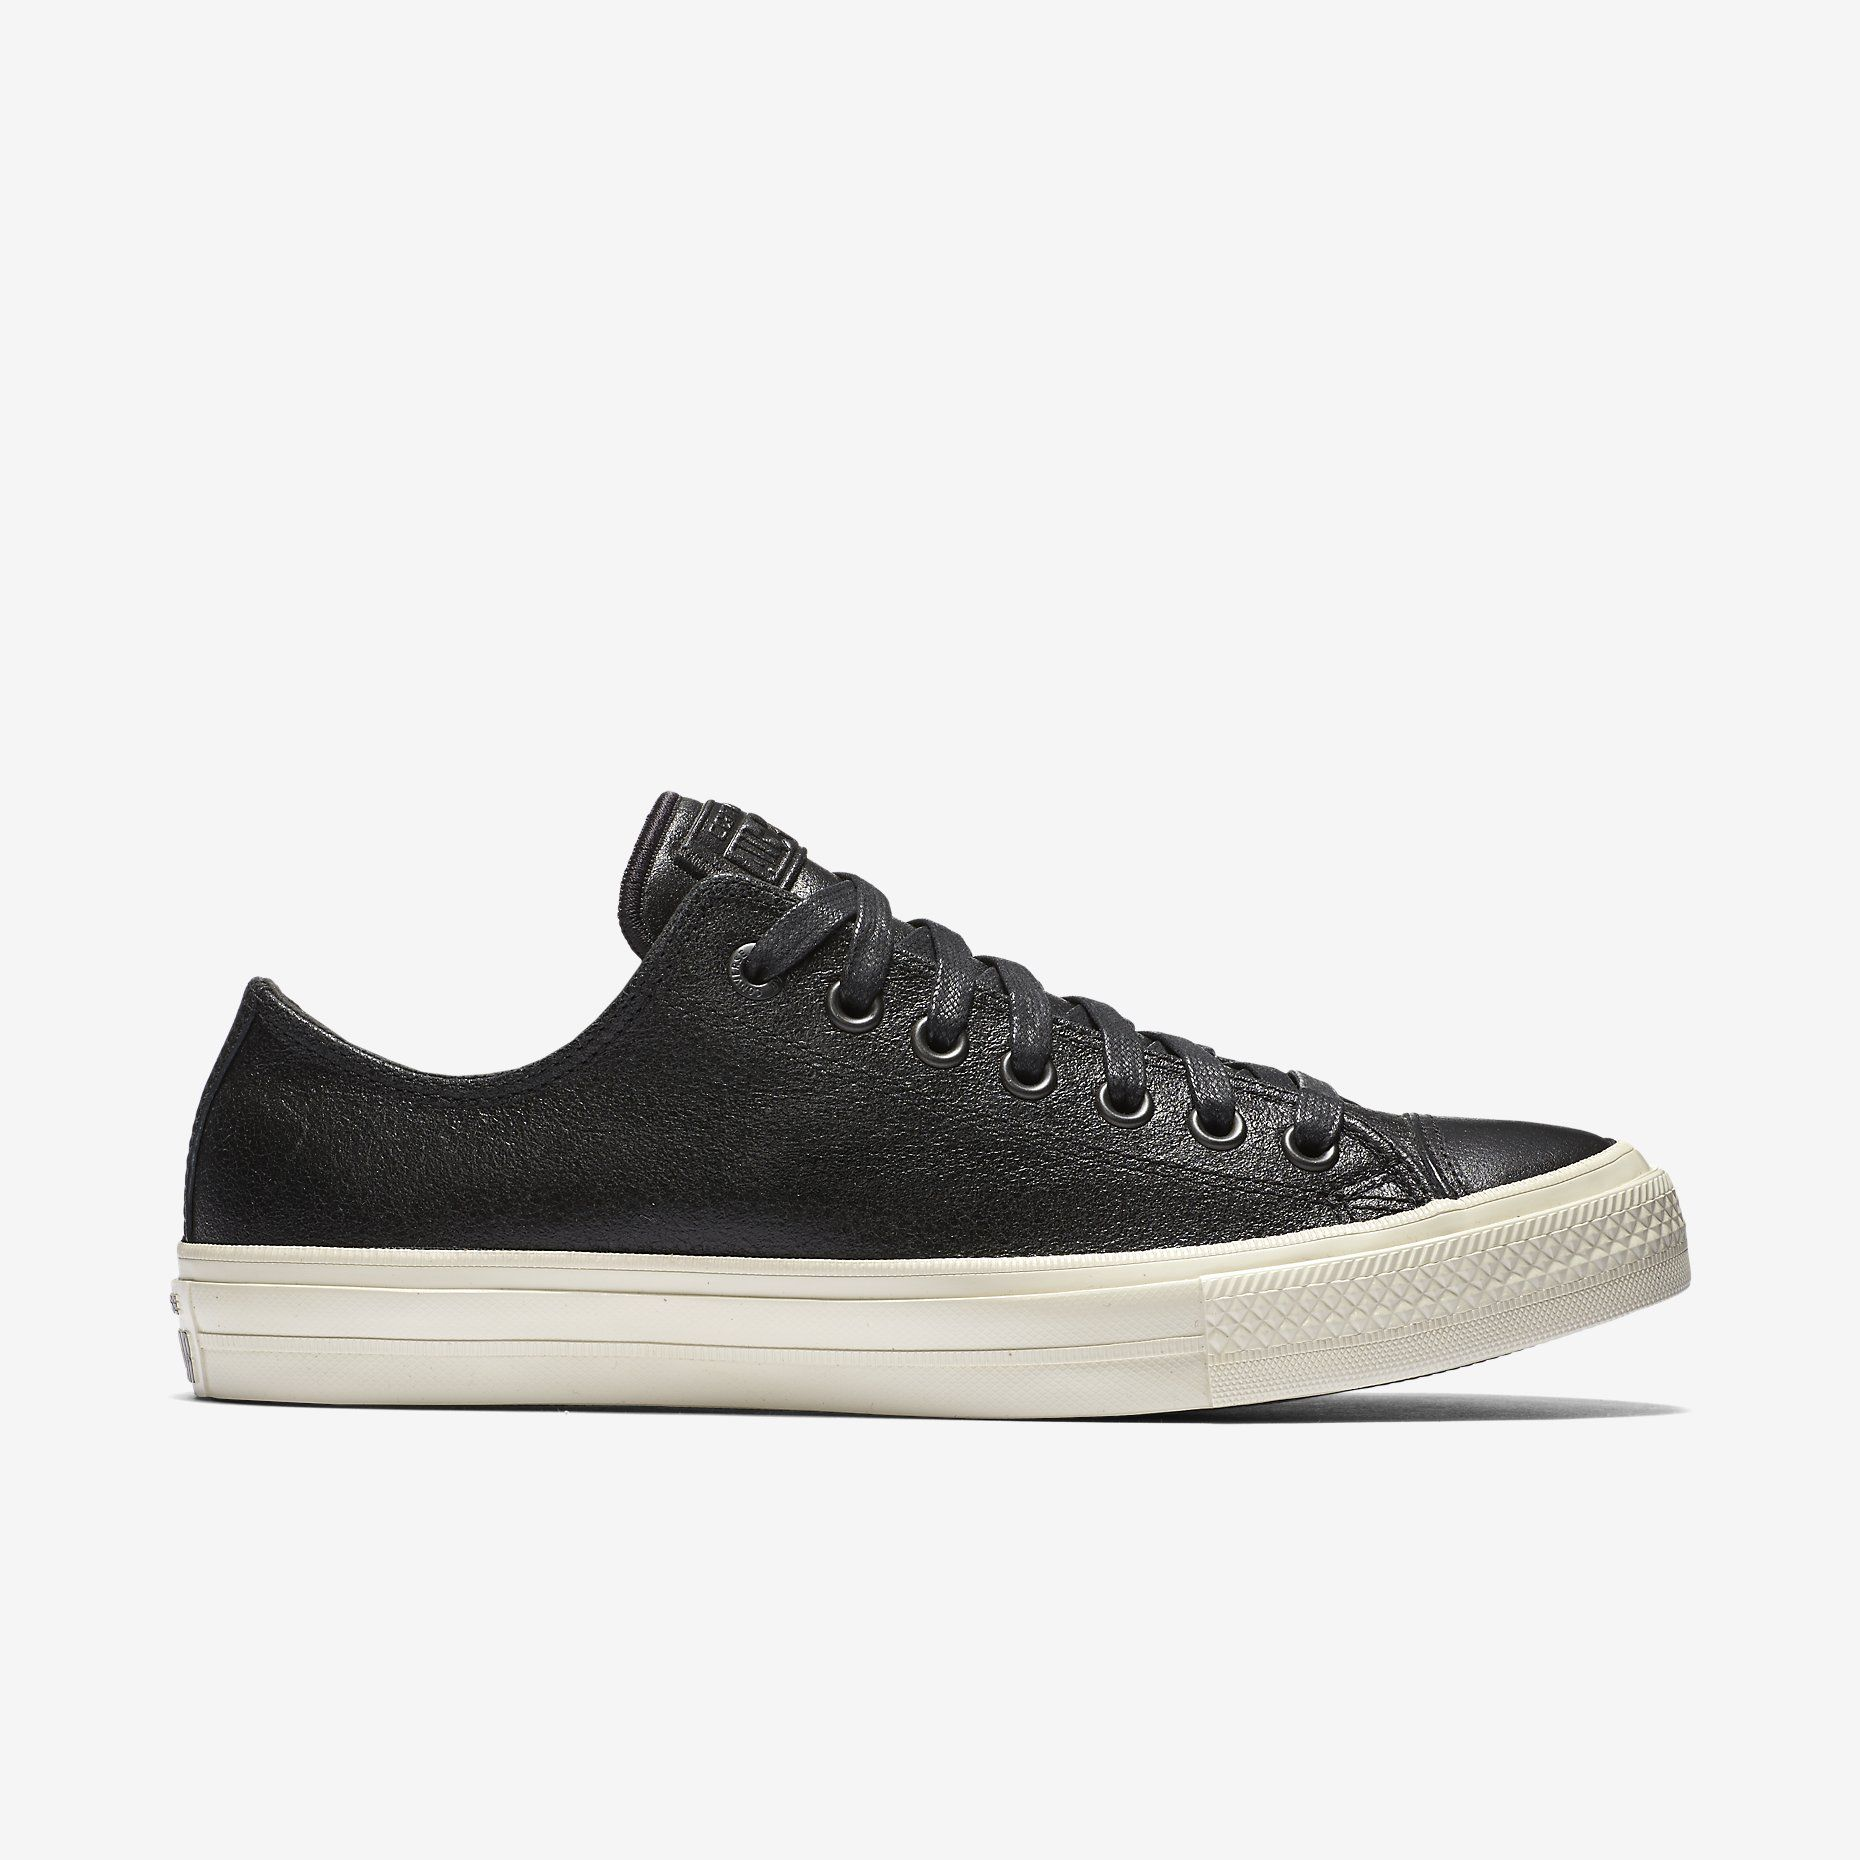 best authentic 272e3 3014d ... discount code for converse x john varvatos chuck ii leather low 4ec29  2ca7d